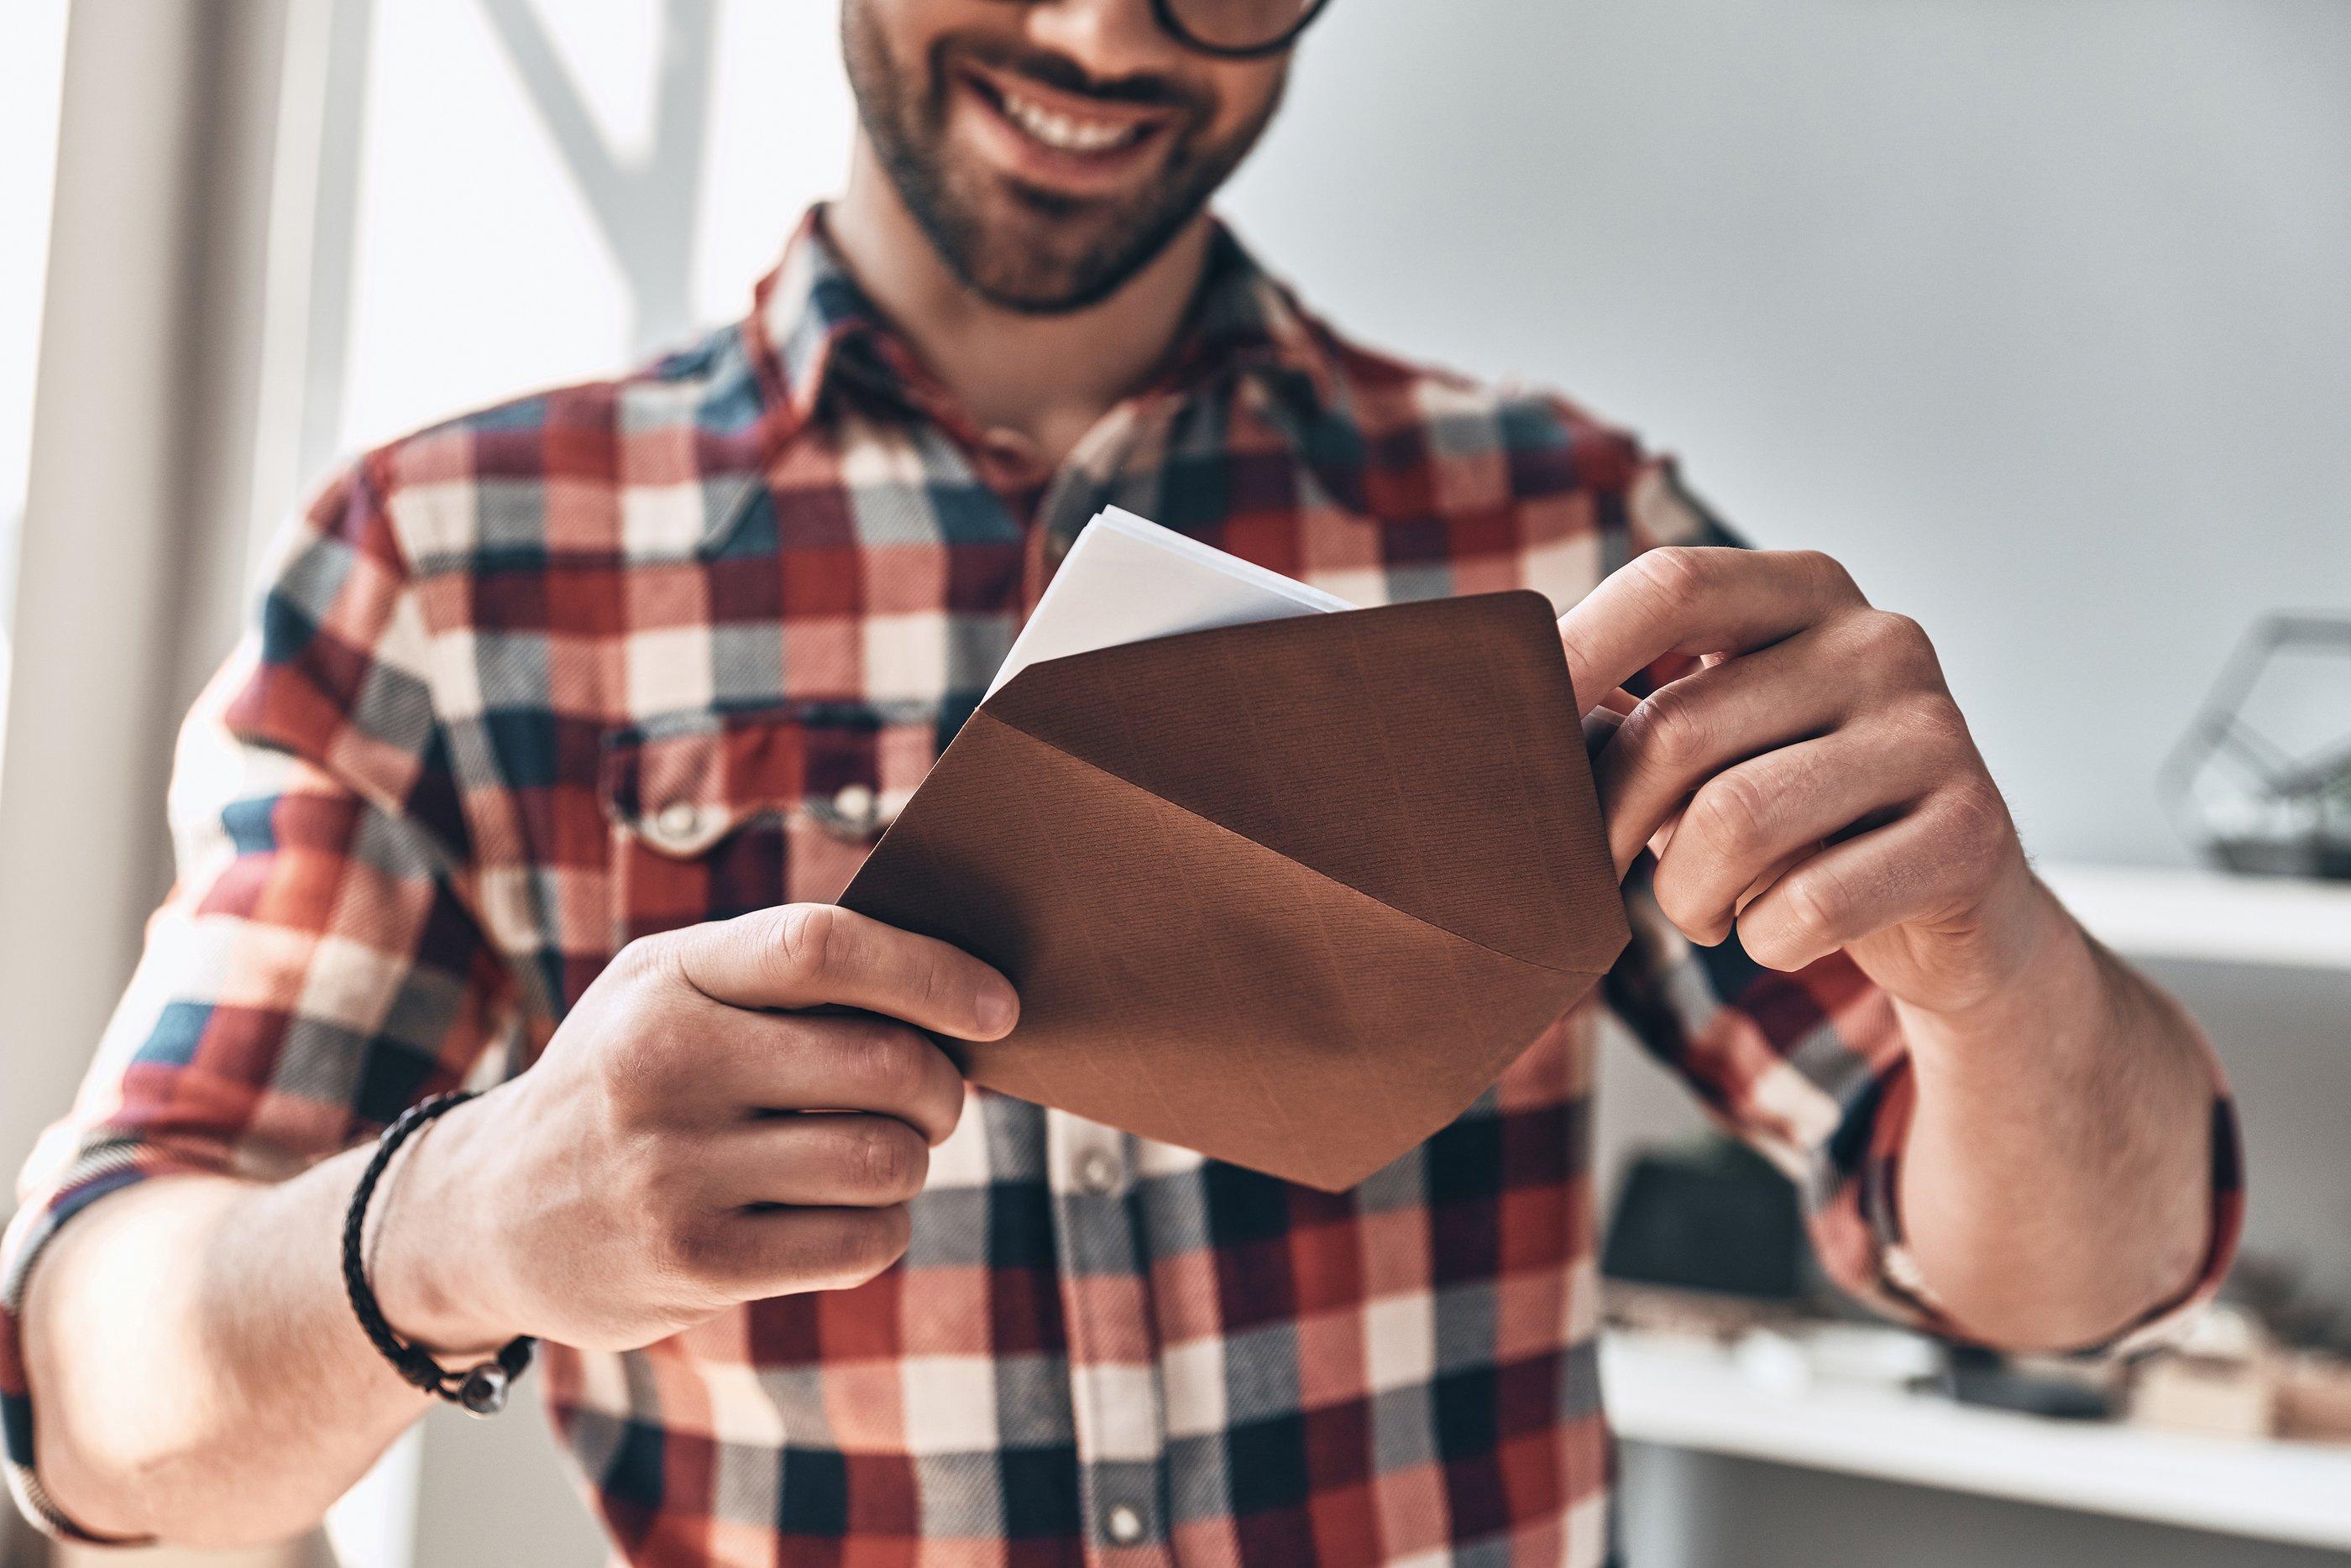 bigstock-Receiving-Greeting-Card-Close-239099077